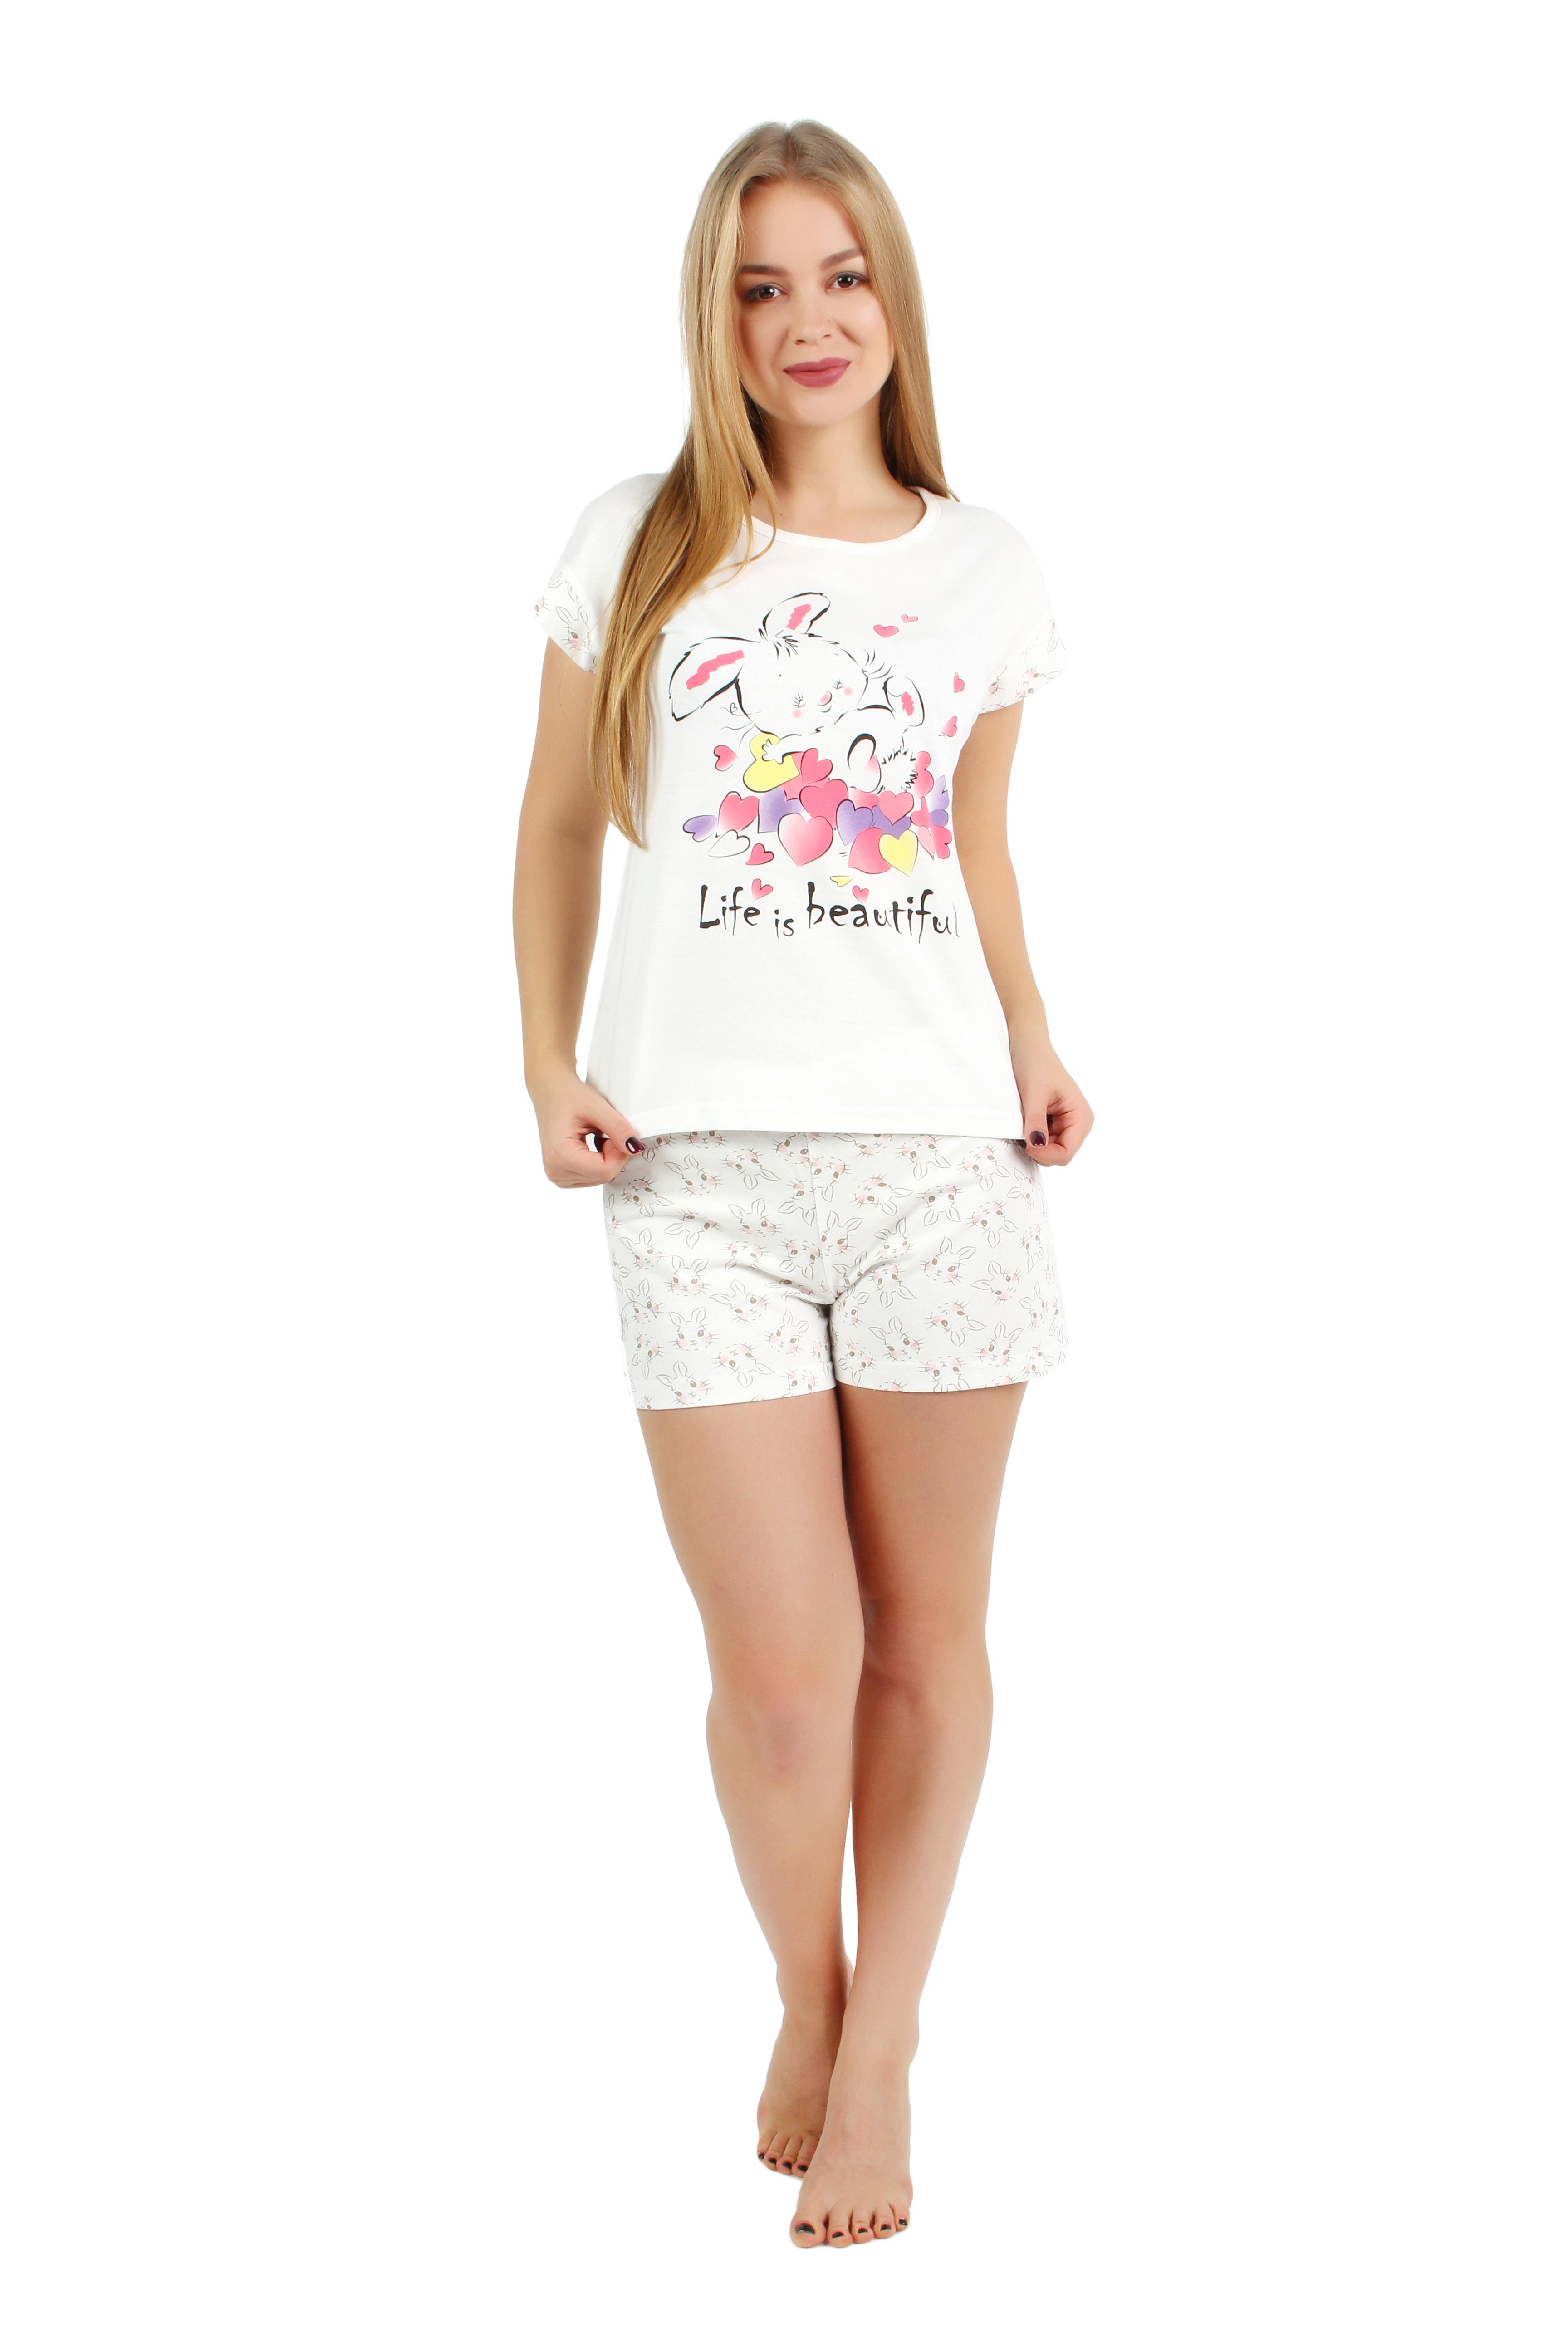 Жен. пижама арт. 16-0251 р. 54 - Женская одежда артикул: 29254